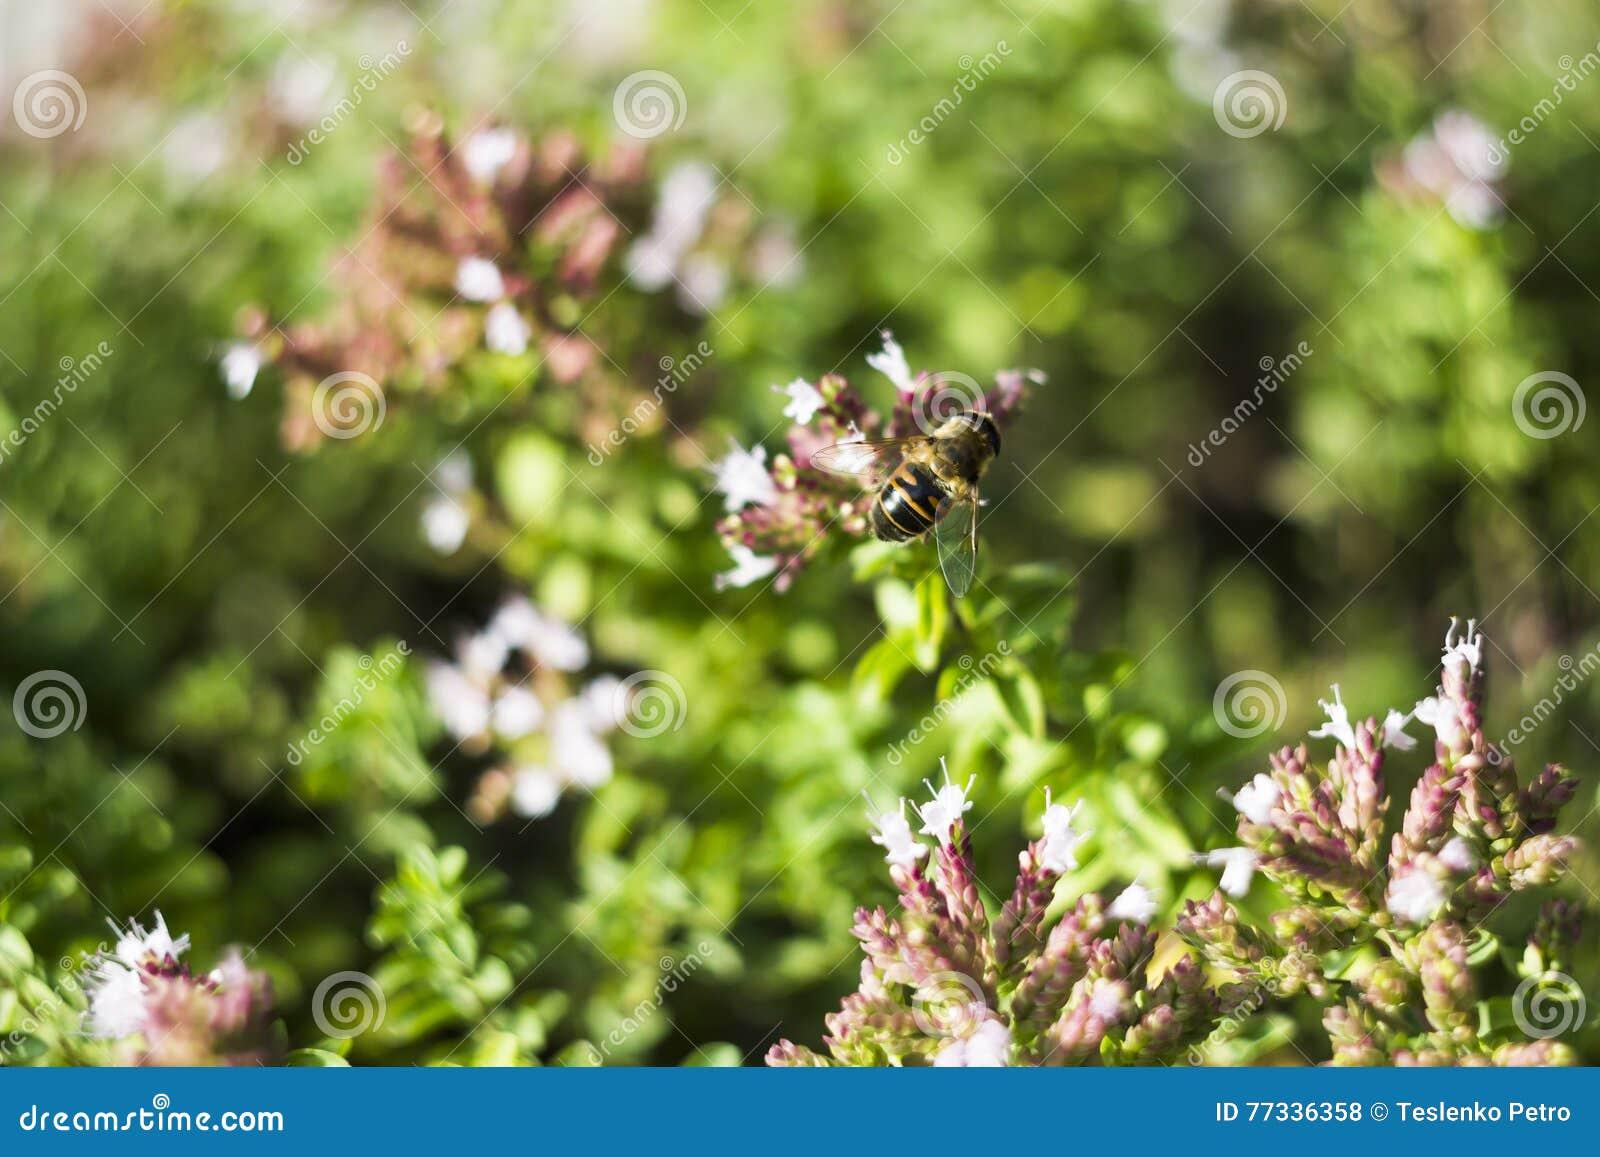 Truteń komarnica & x28; Eristalis tenax& x29; na kwiacie